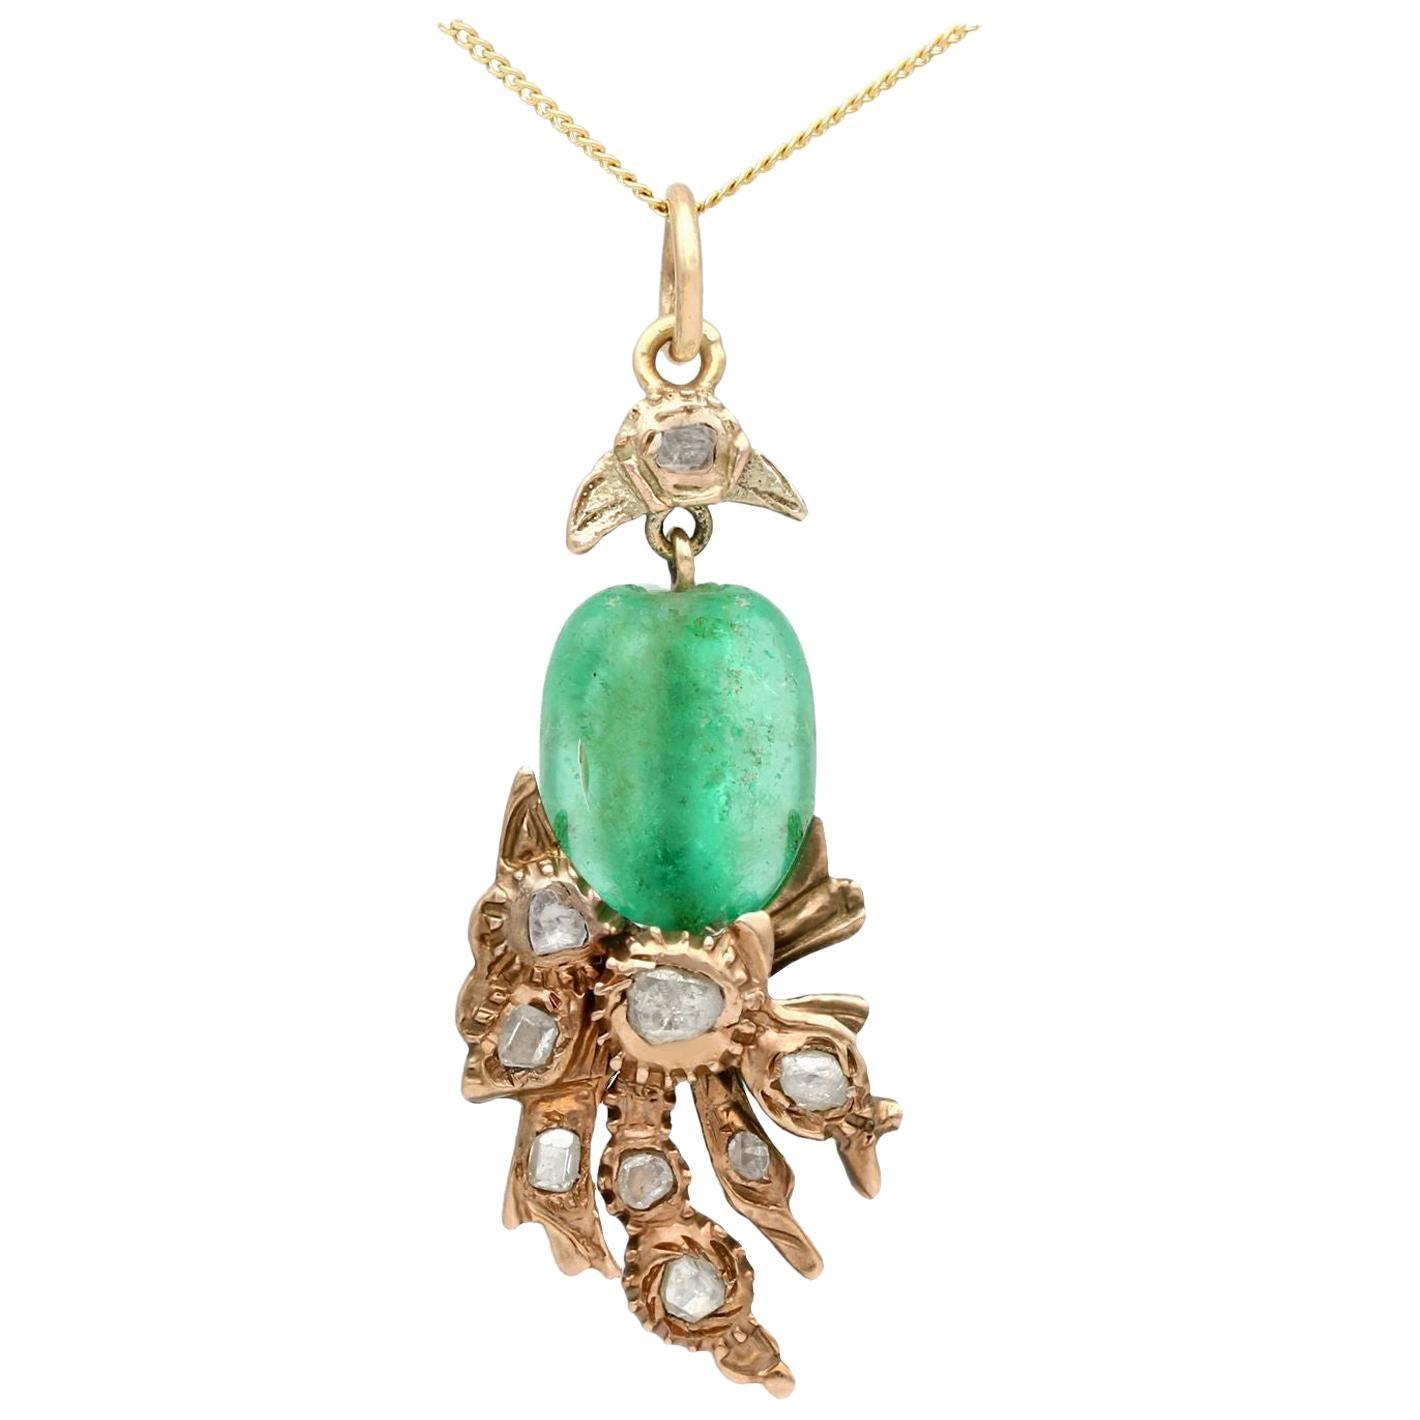 1890 Antique Victorian Emerald and Diamond Yellow Gold Pendant